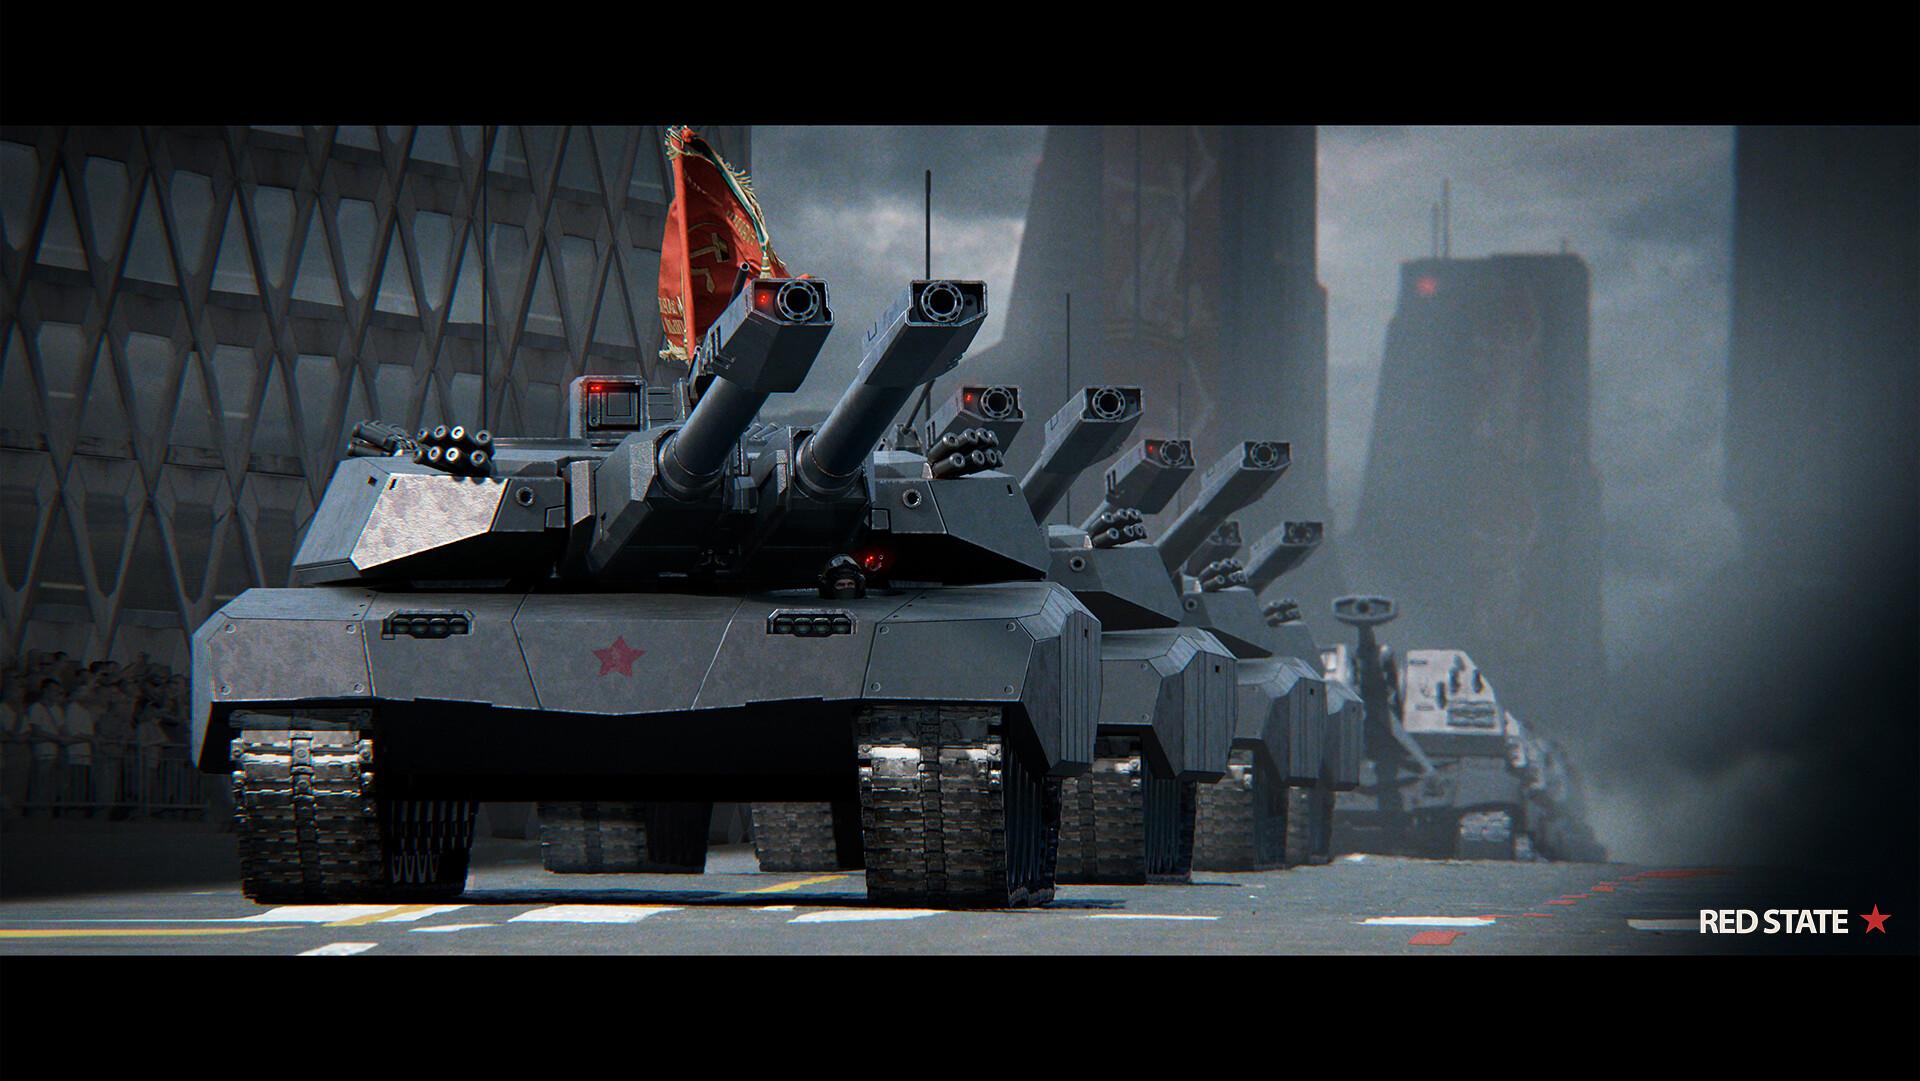 andrei-kurylovich-tank-show-v7-as.jpg?1553971140